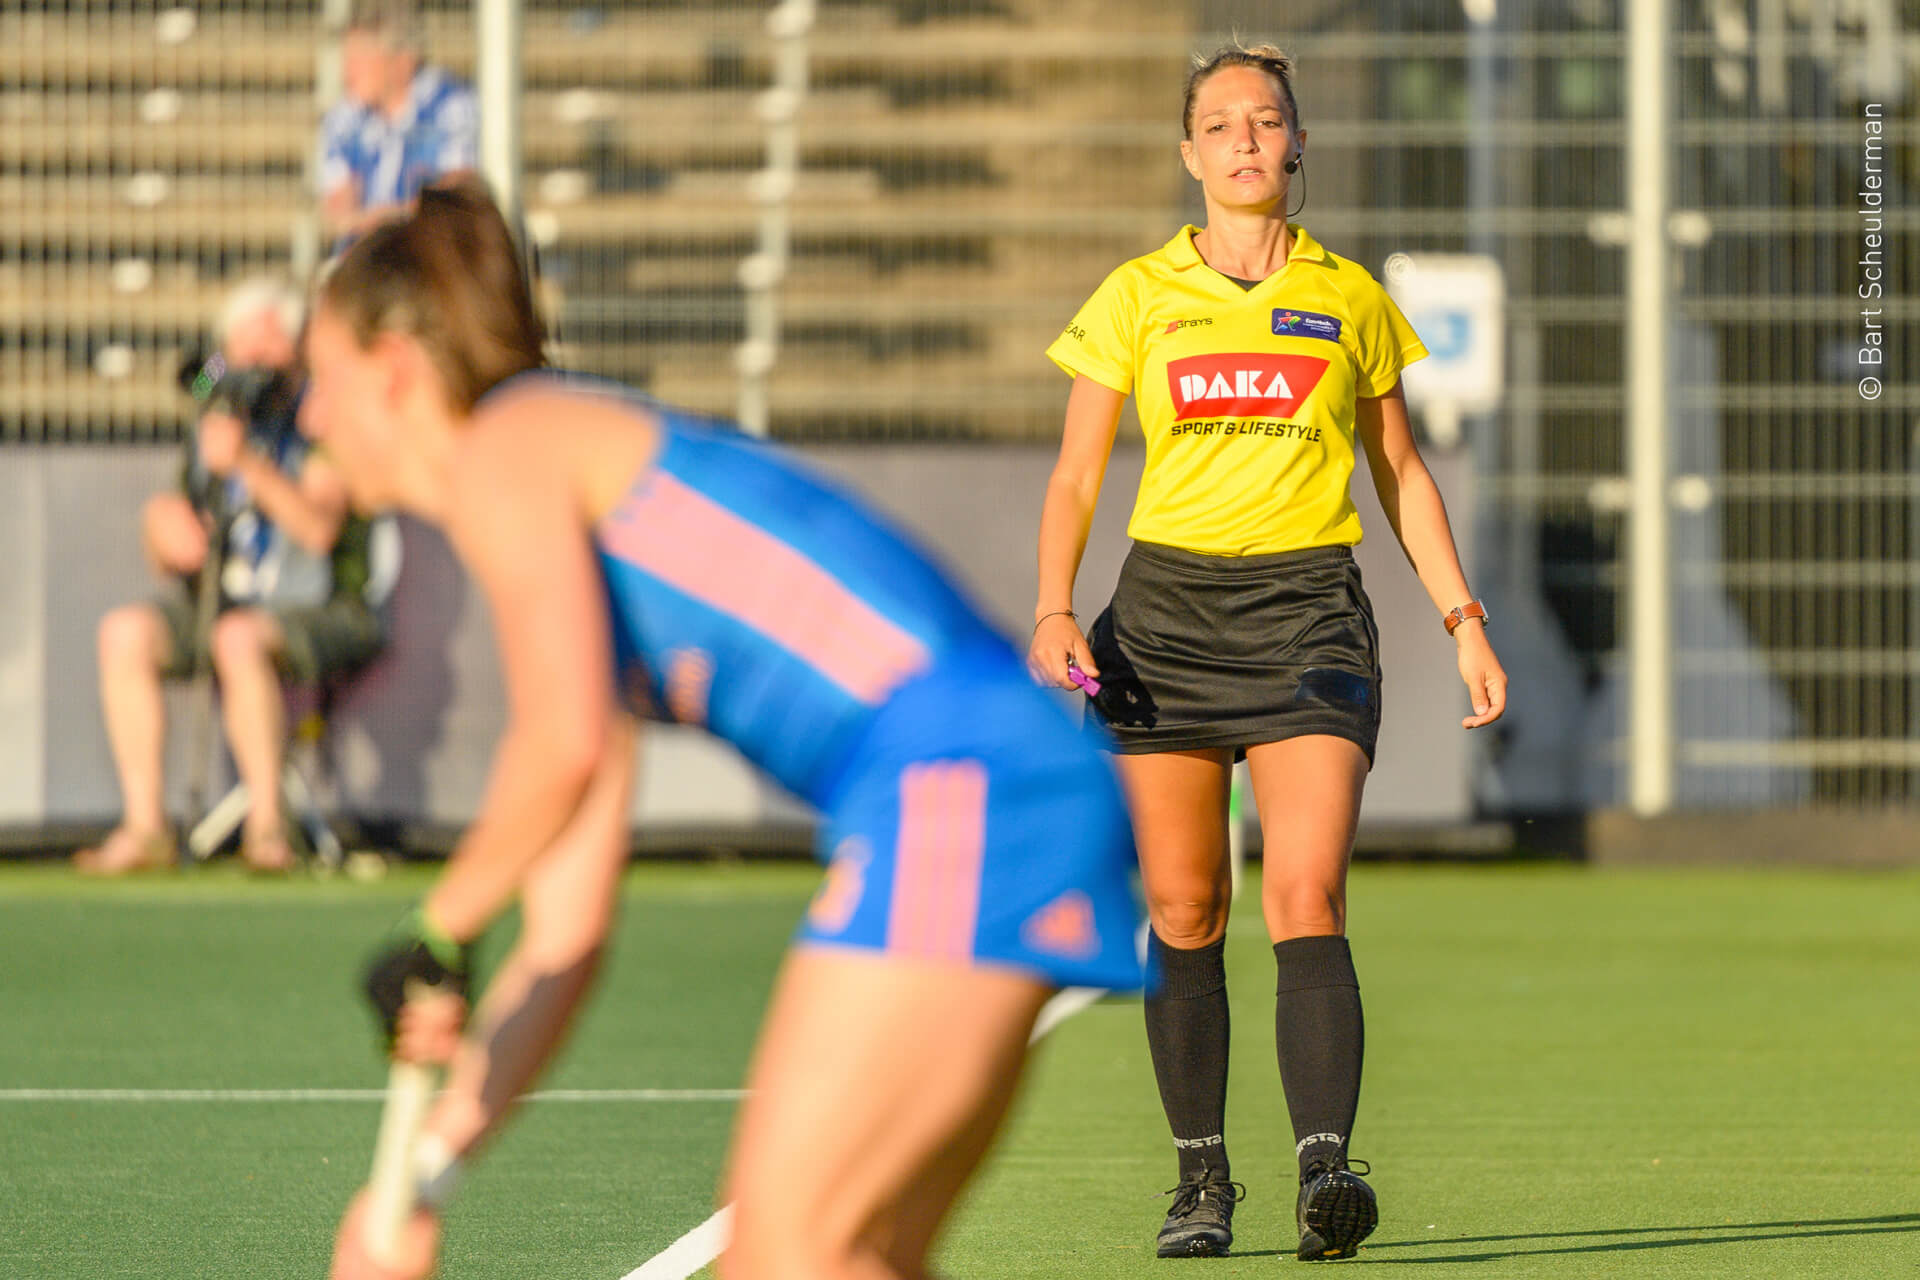 Amstelveen, 07-06-2021, Wagener Stadion, EuroHockey Championship 2021 Women. Spain - Netherlands. Umpire Celine Martin-Schmets.